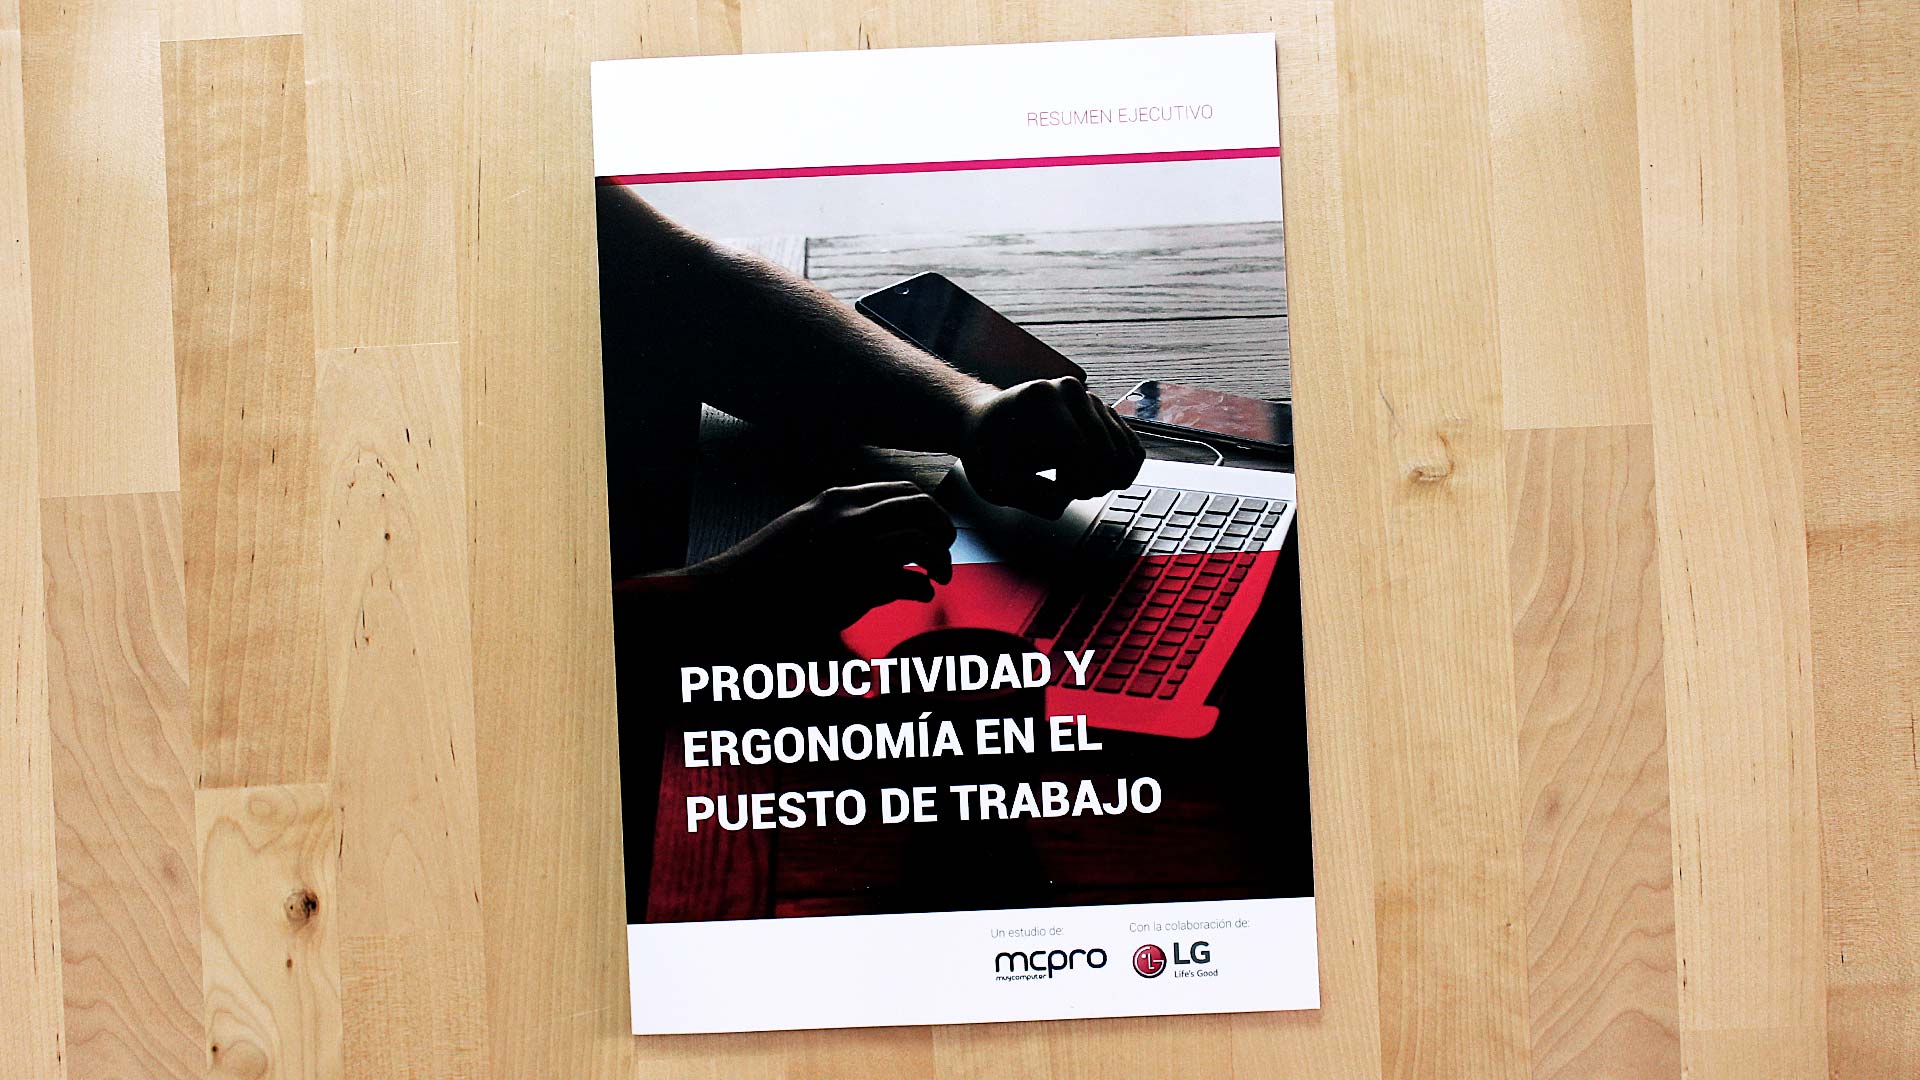 LG--content-marketing-informe-resumen-ejecutivo-ebook-ergonomia--2017_11